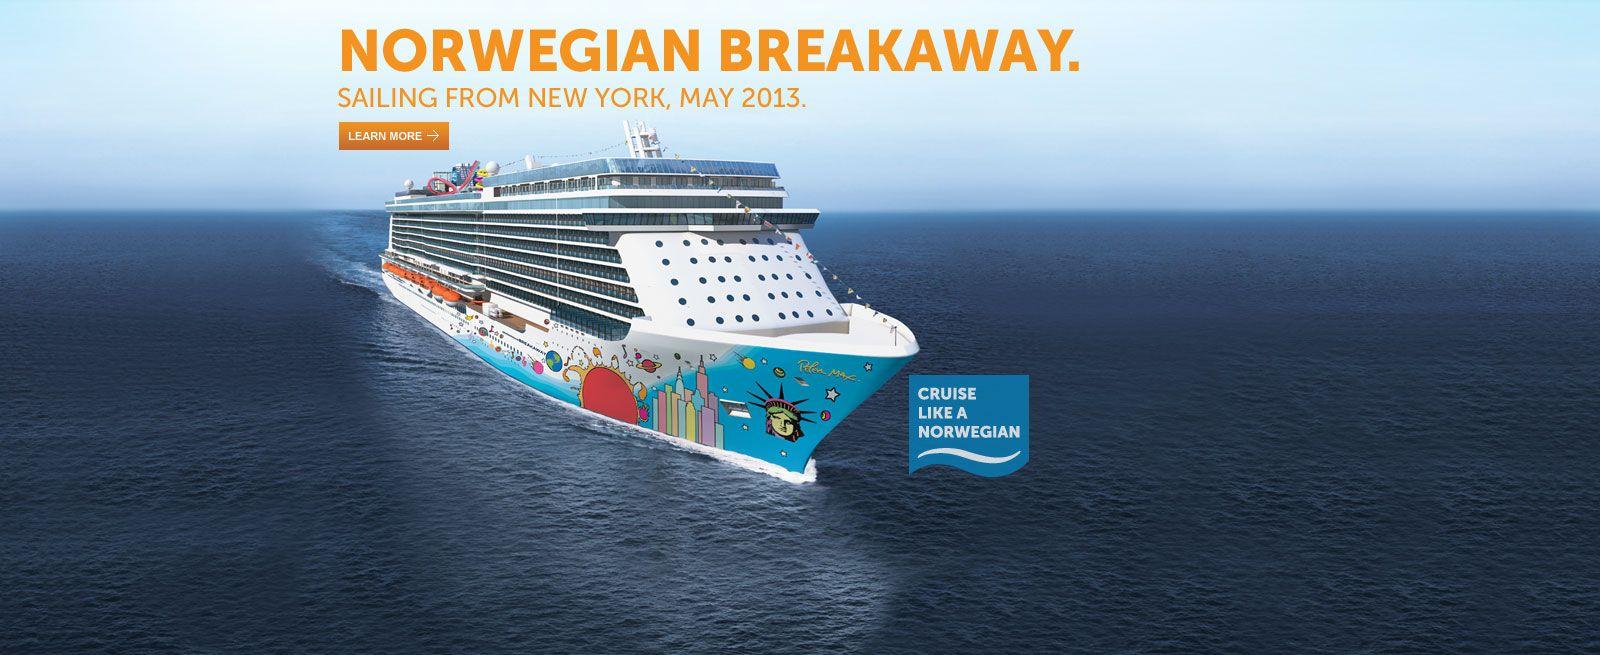 Cruise Deals Vacations Norwegian Cruise Line Norwegian - Bermuda cruise deals